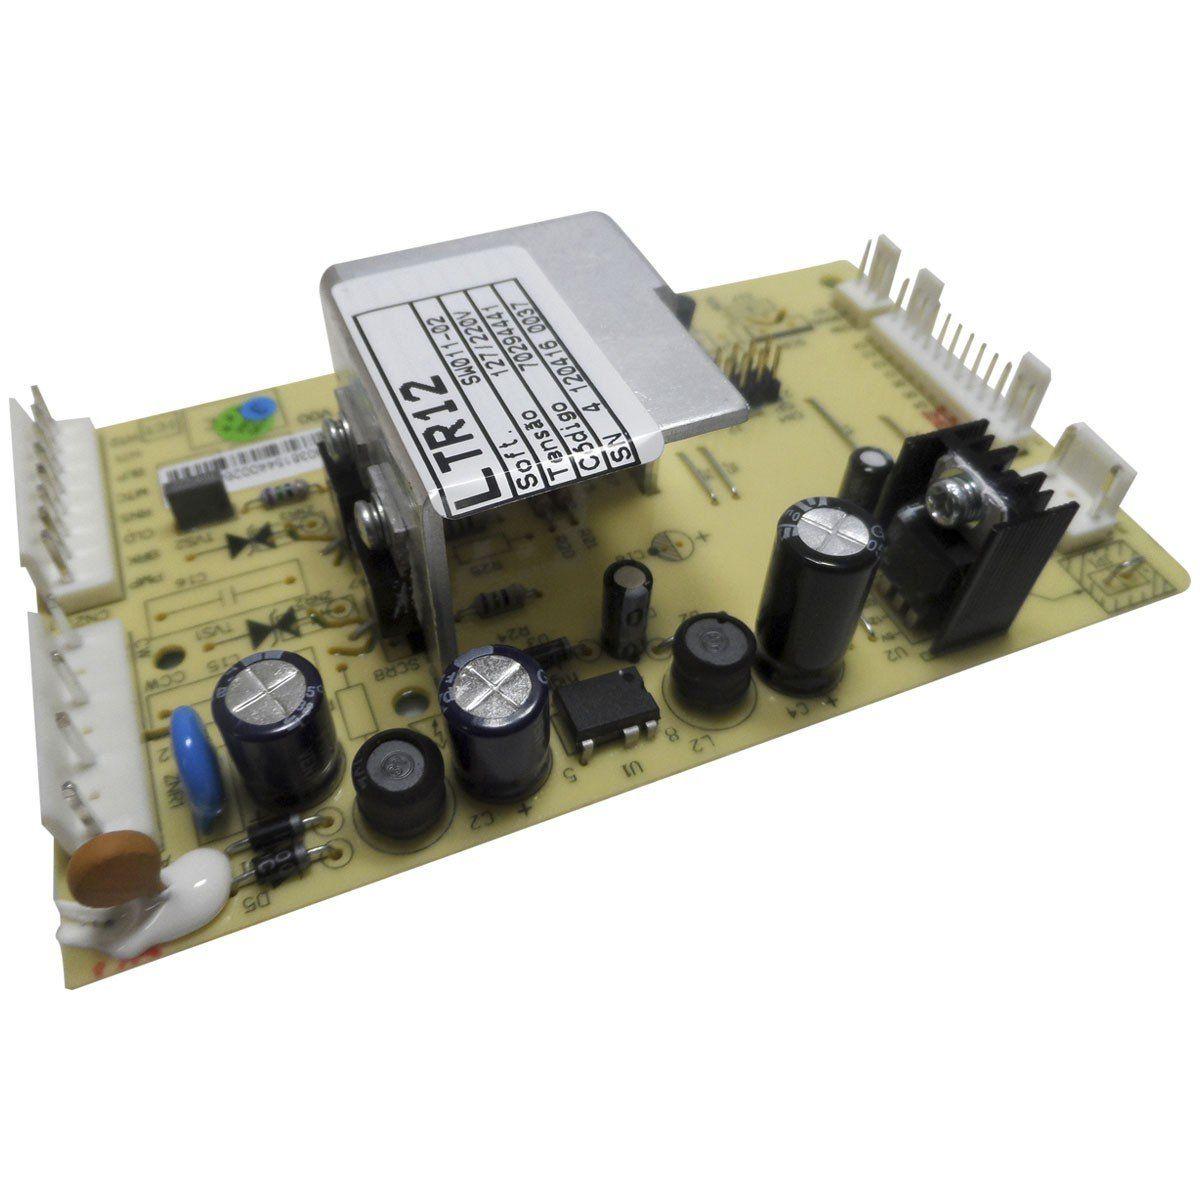 Placa Eletrônica Lavadora Electrolux